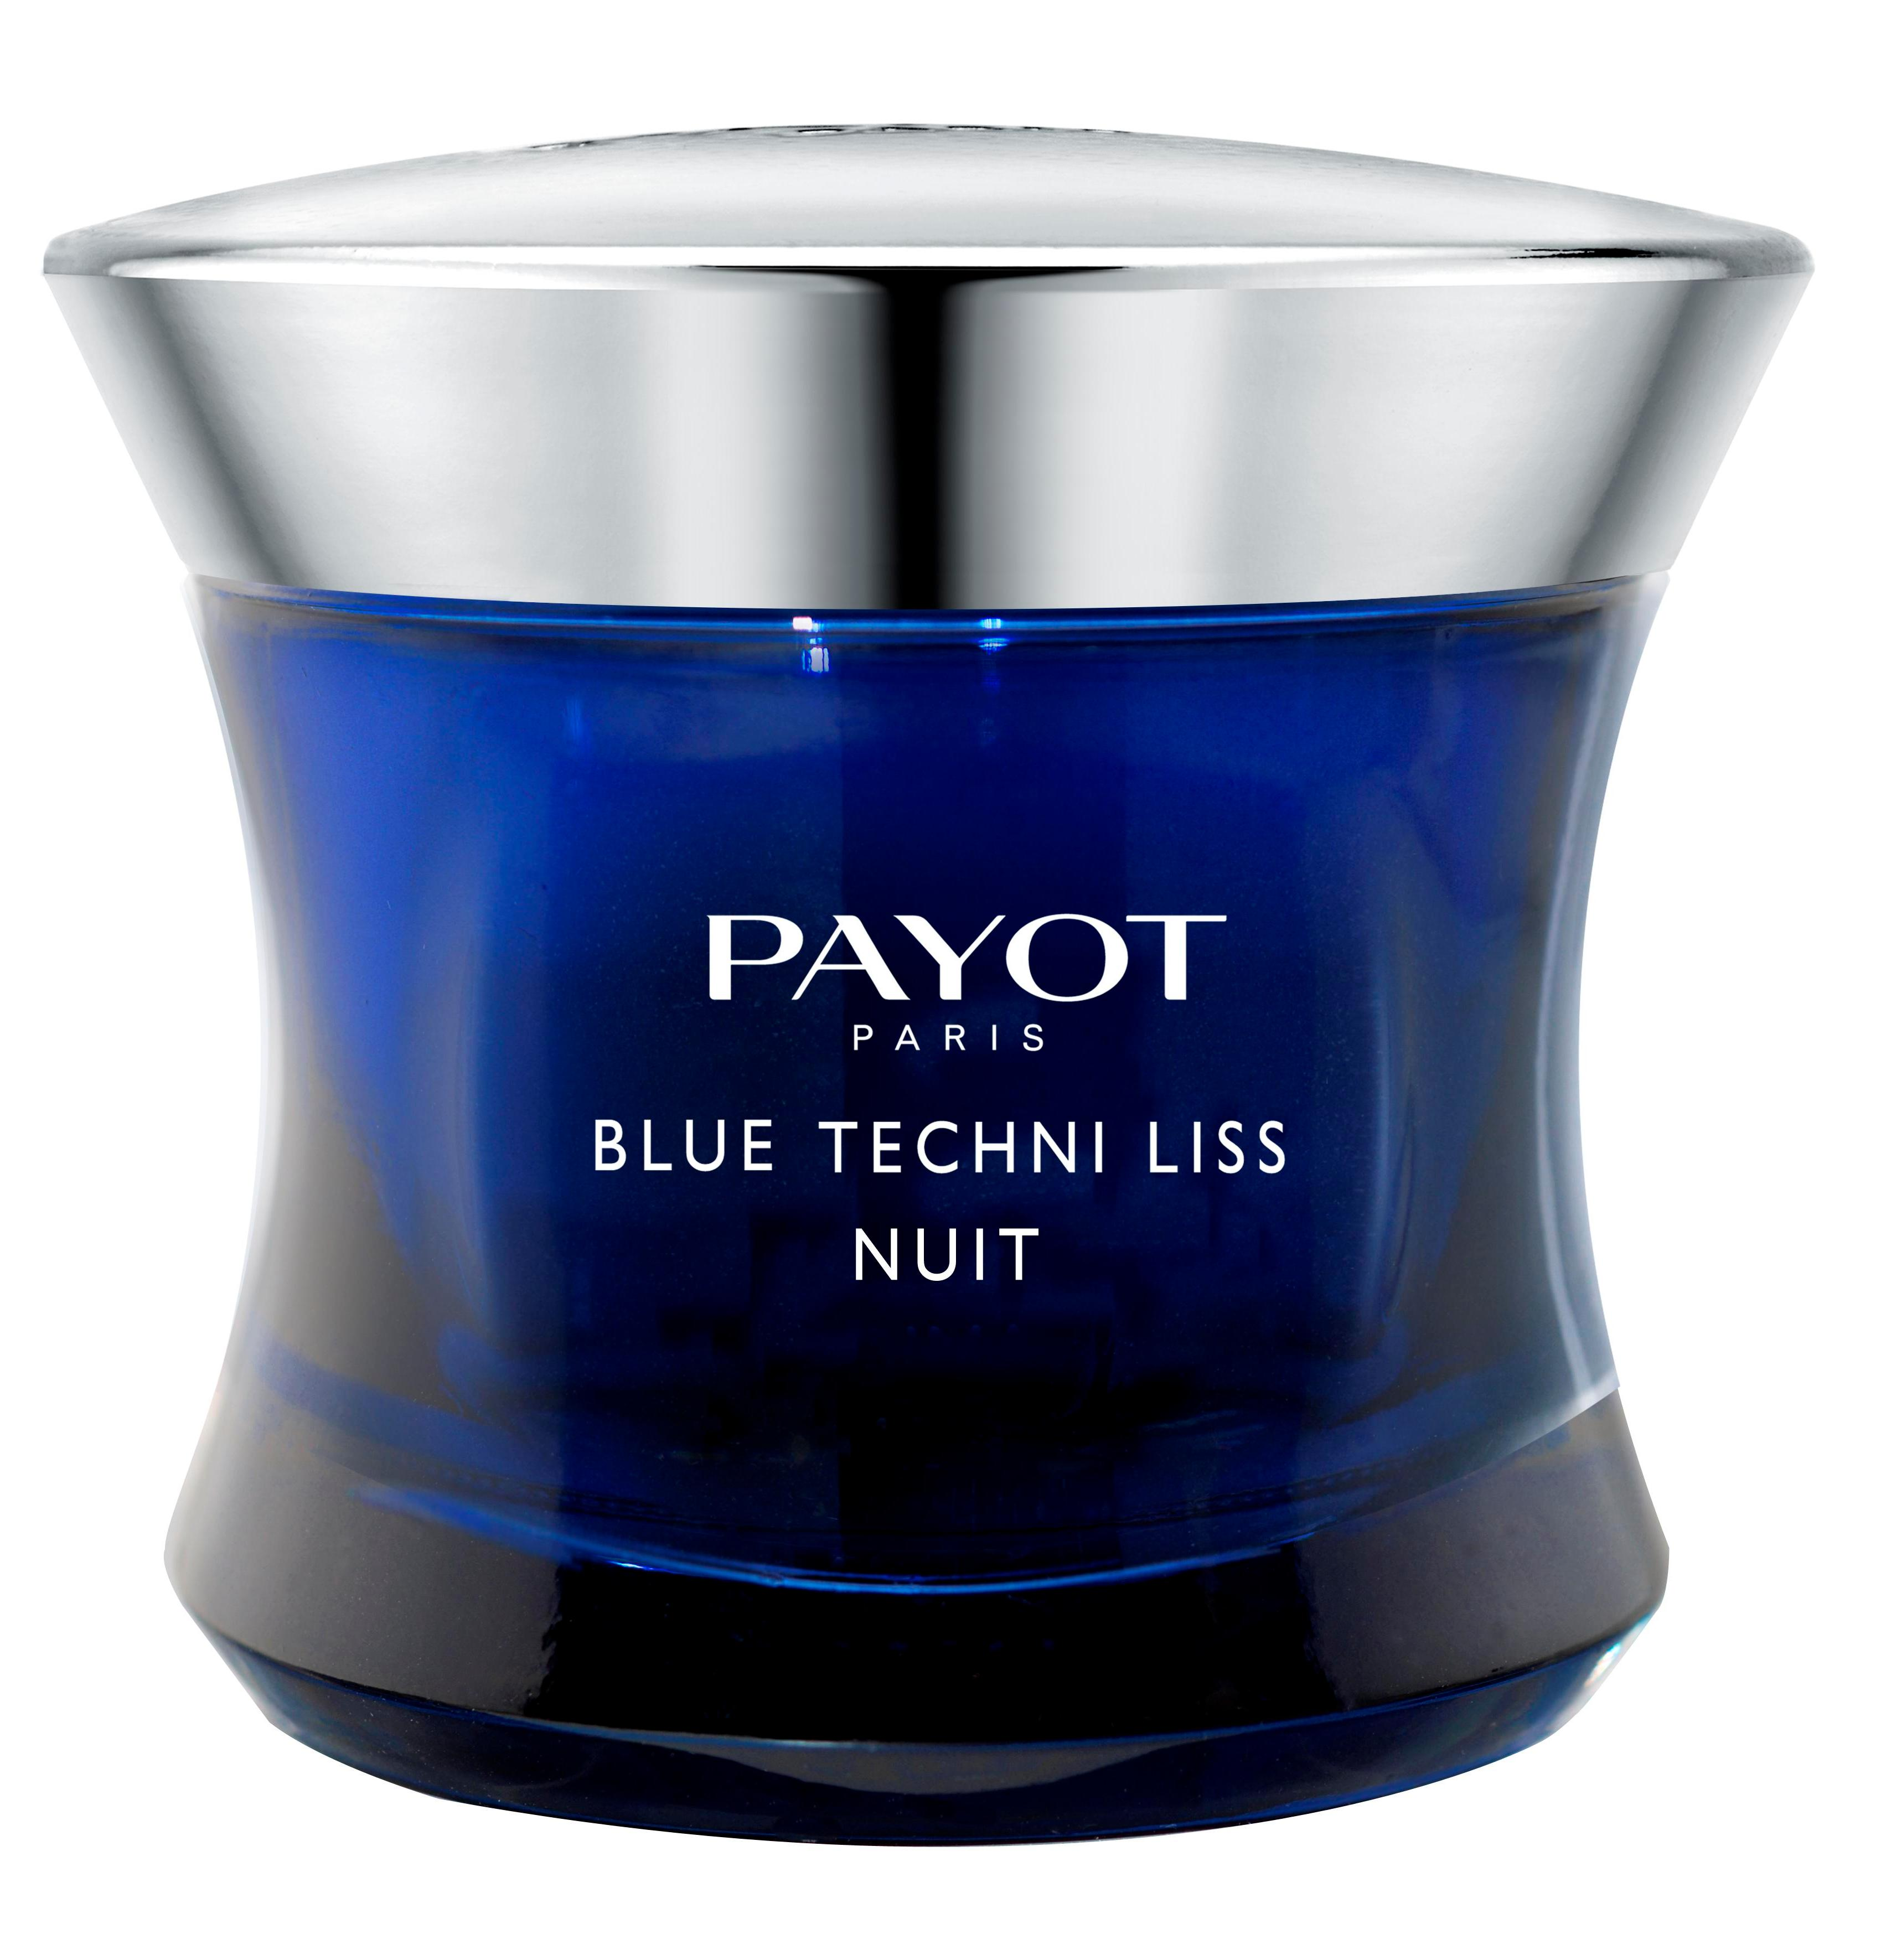 PAYOT Бальзам хроноактивный ночной / BLUE TECHNI LISS 50 мл